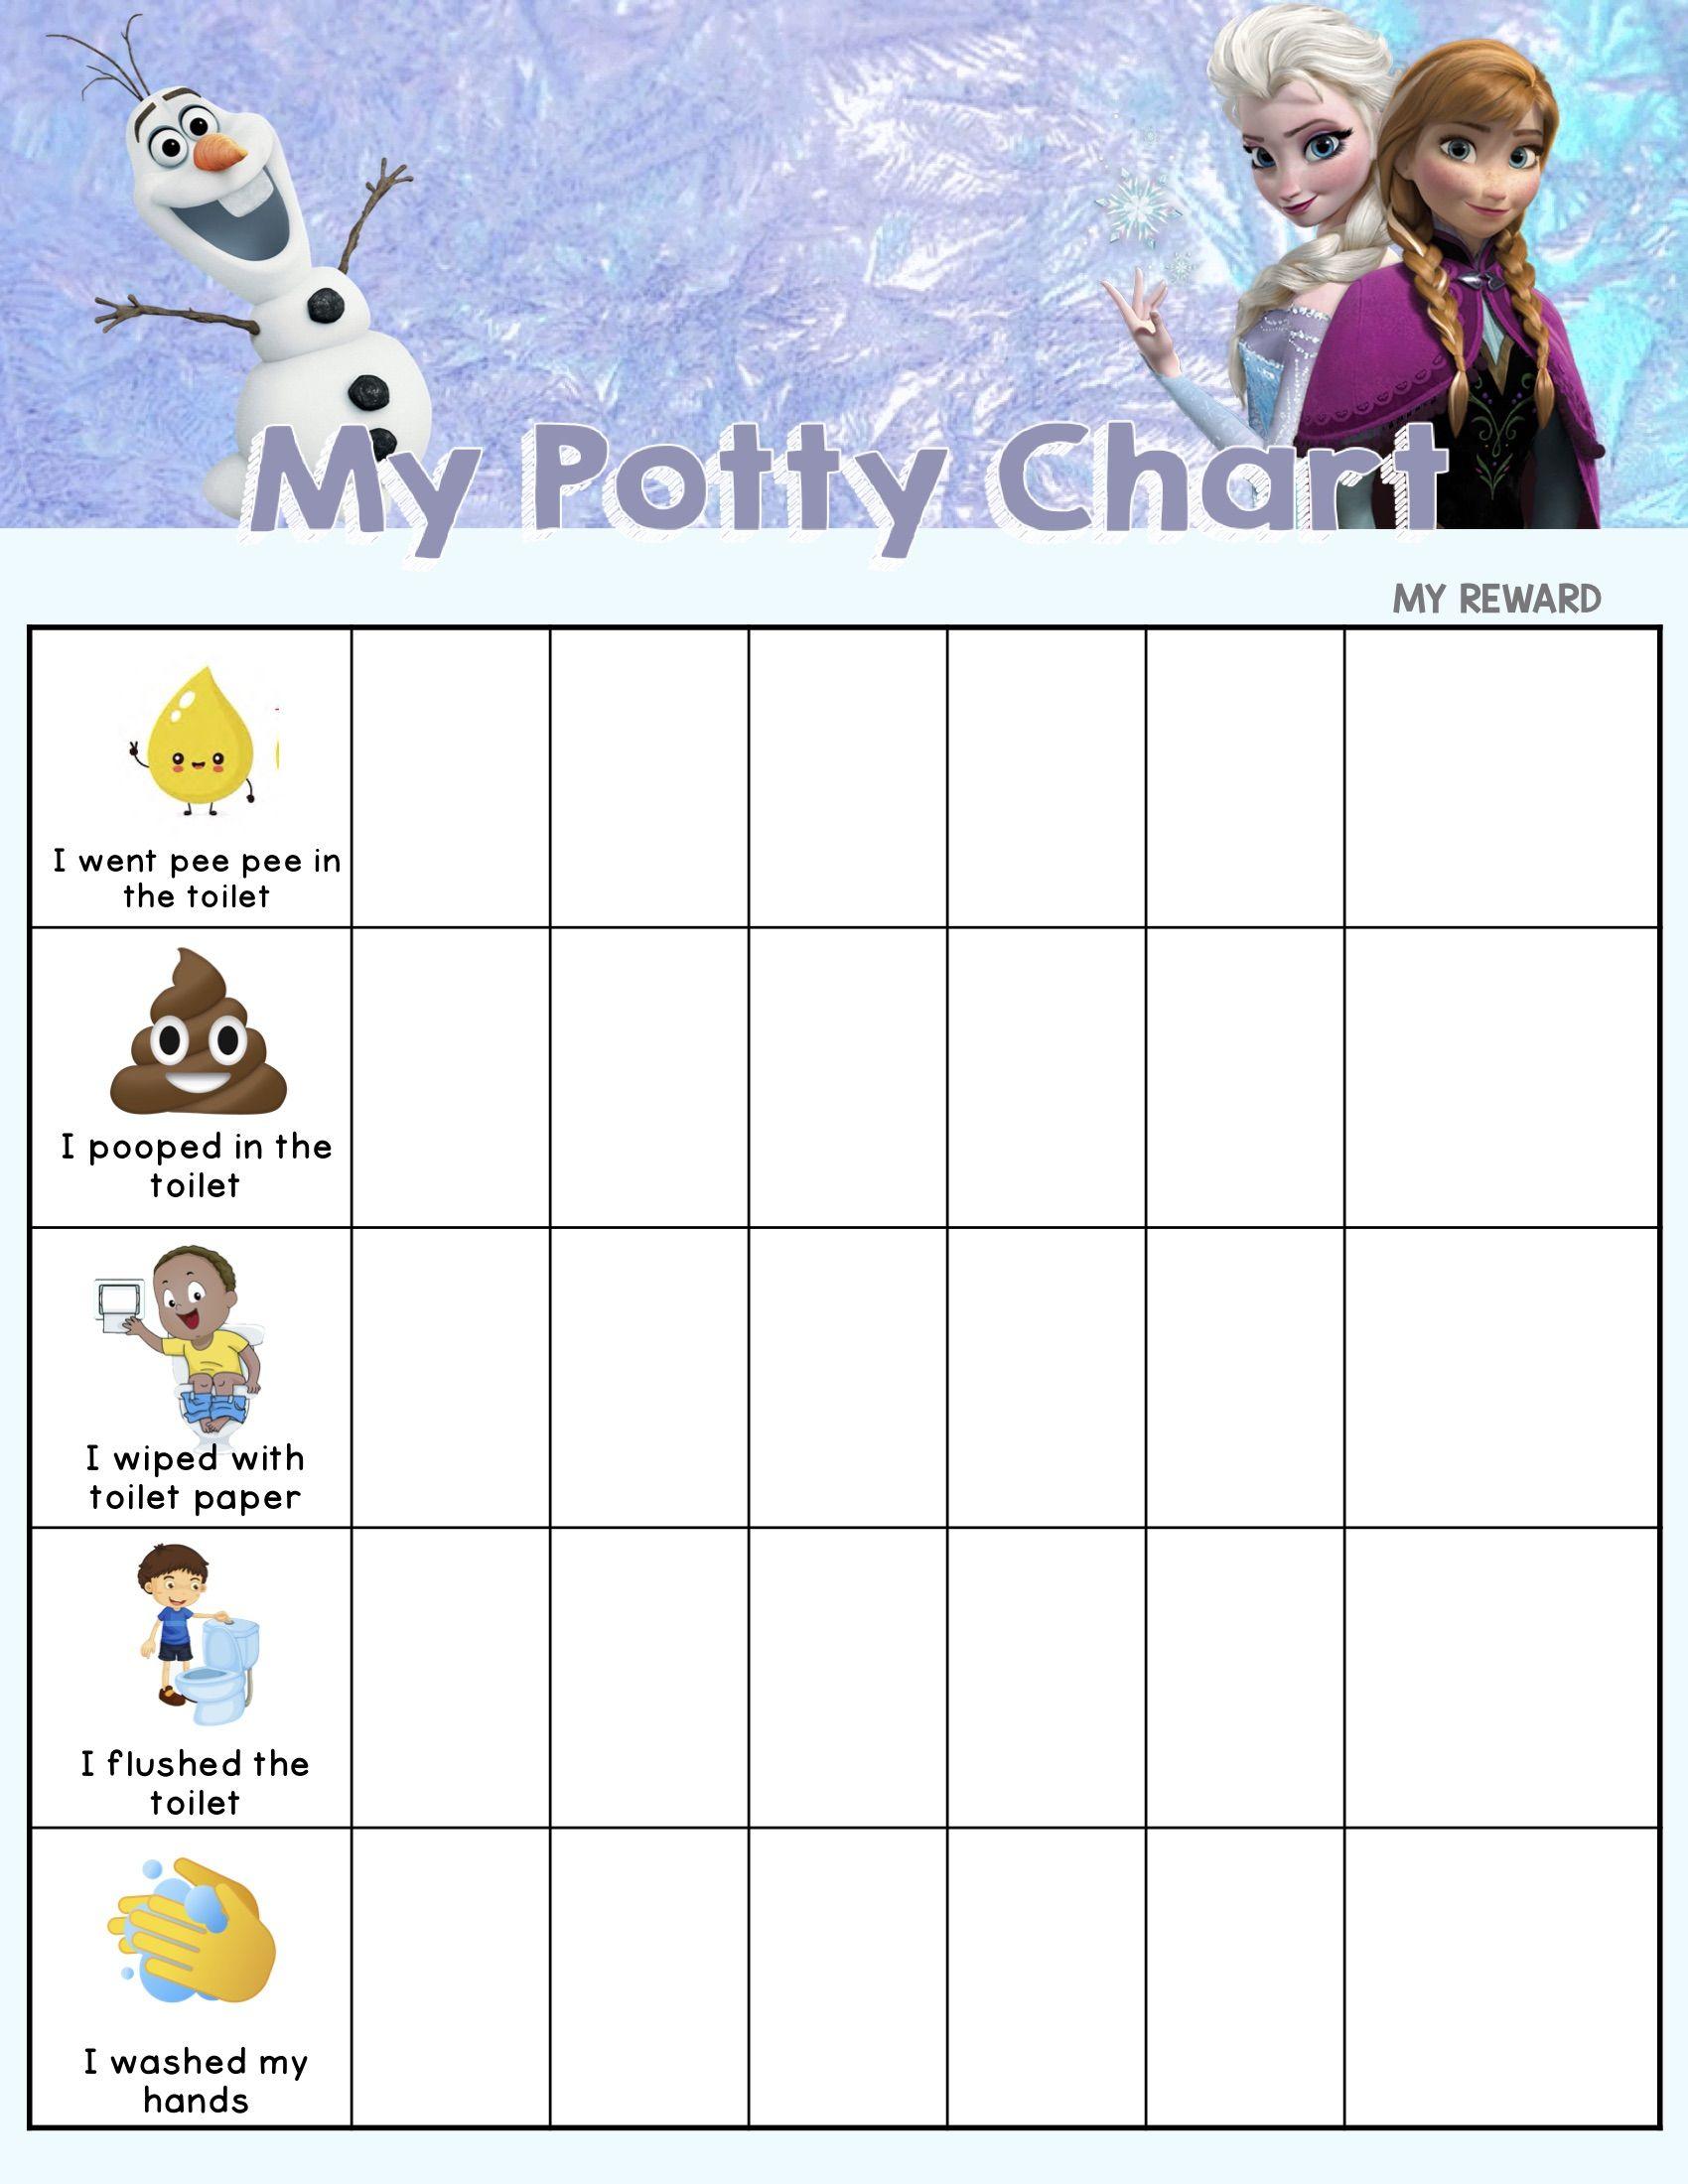 Frozen Potty Chart In 2020 Potty Chart Potty Training Sticker Chart Potty Training Kids